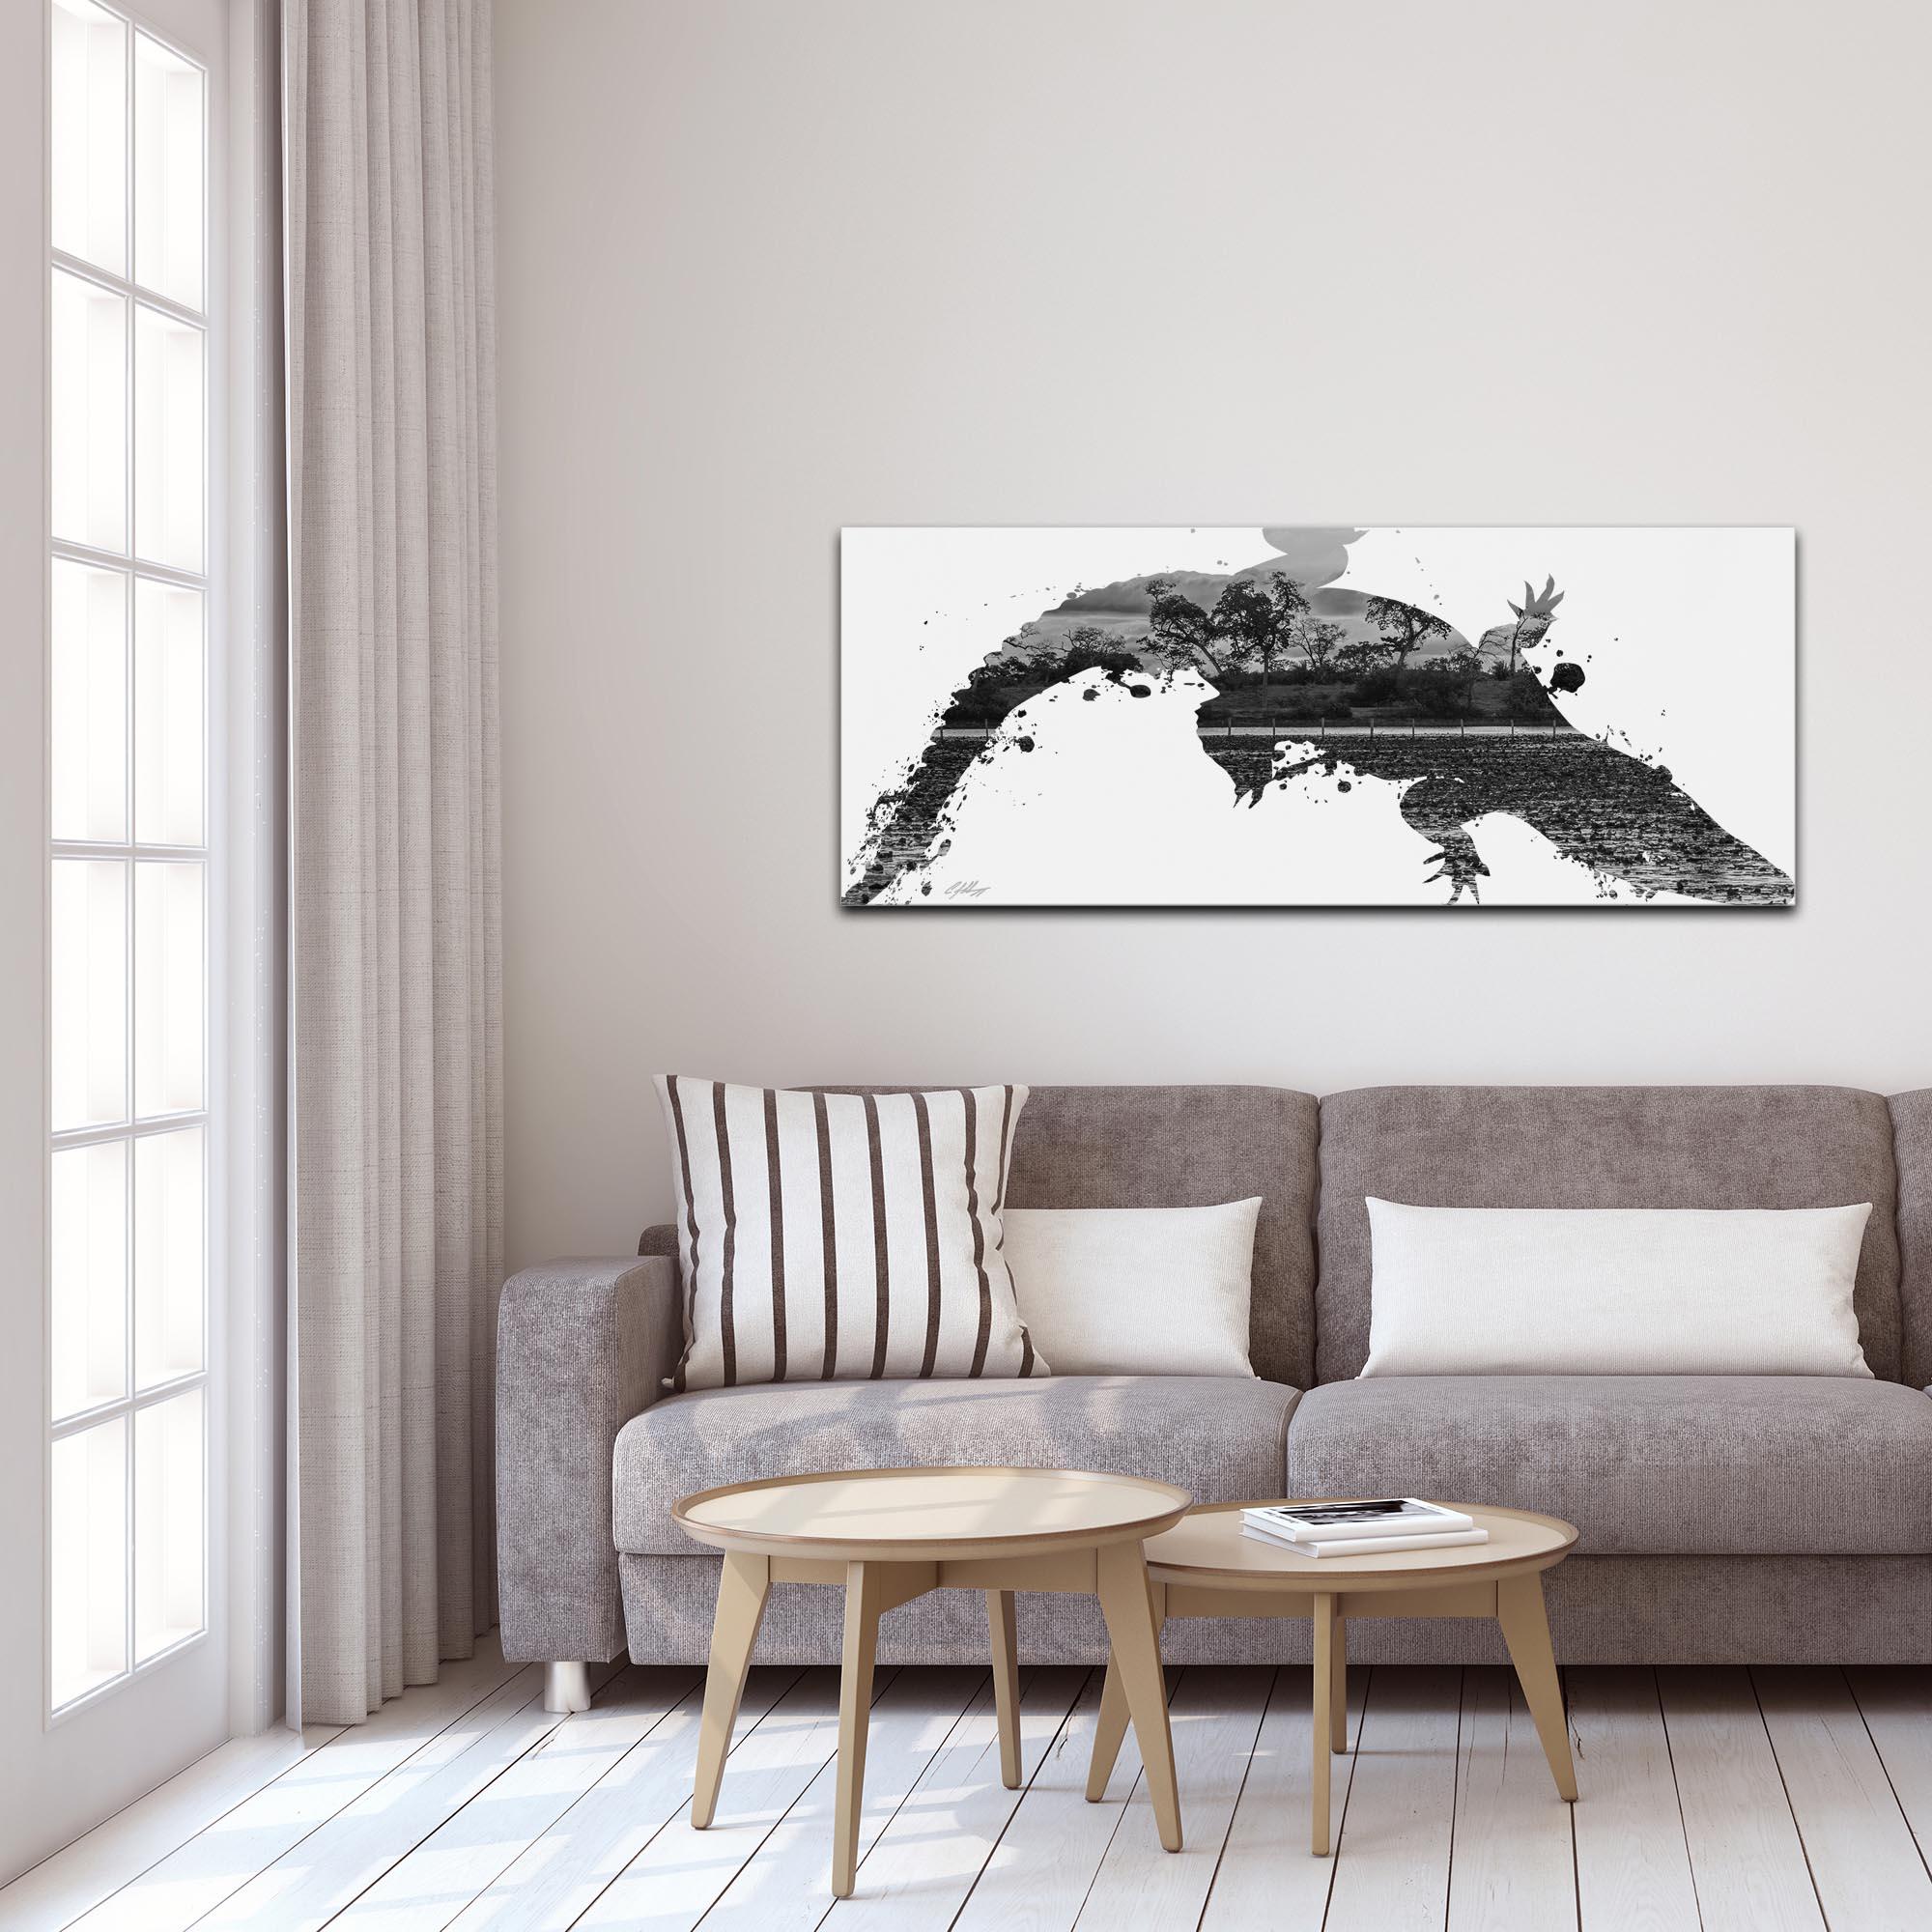 Alligator Swamp Gray by Adam Schwoeppe Animal Silhouette on White Metal - Lifestyle View